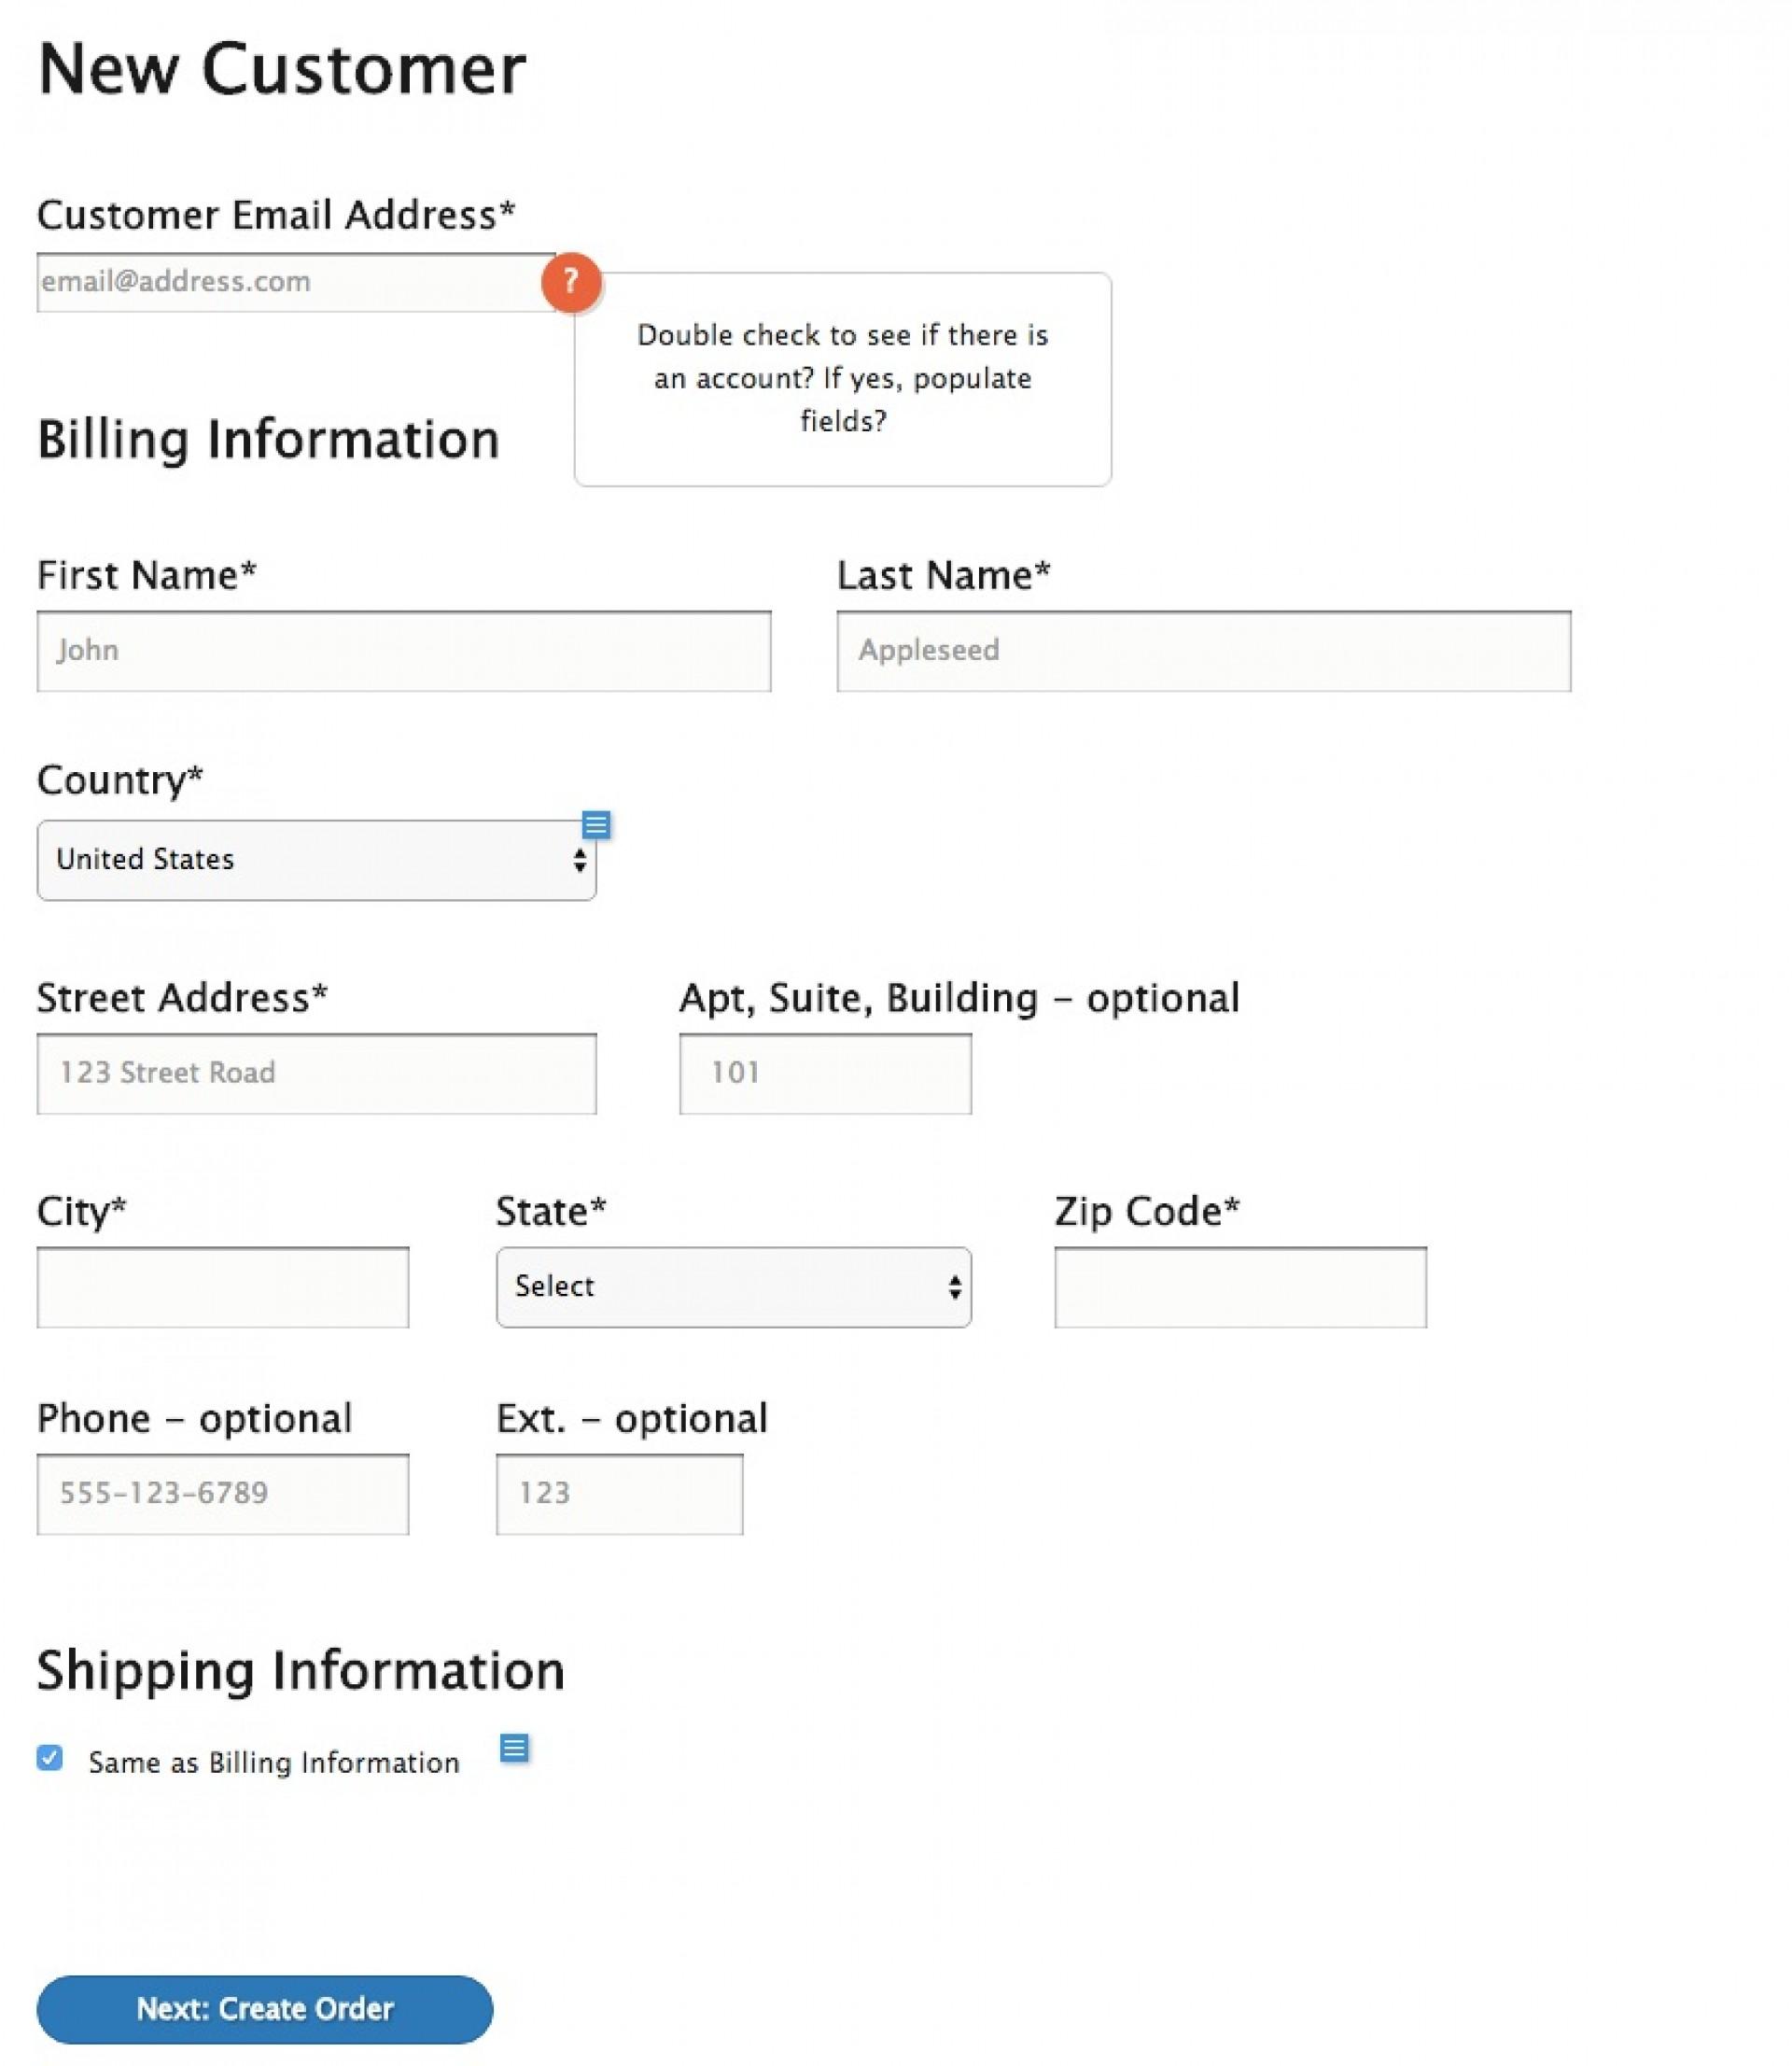 Drupal New Customer Form Template  Uk Account Setup1920